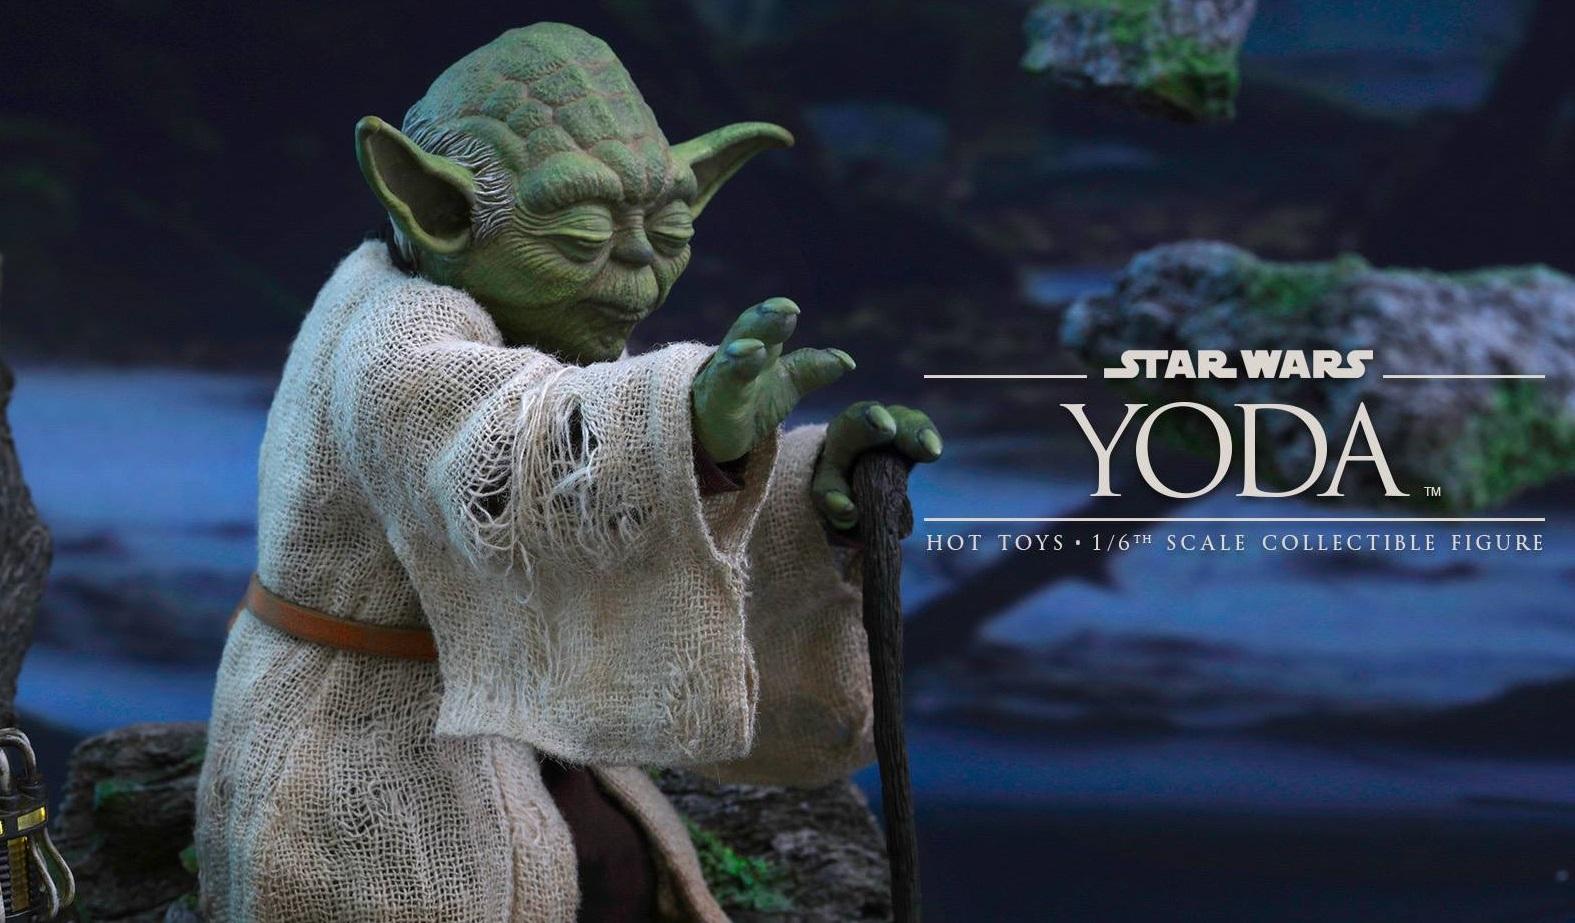 Hot Toys Yoda 1/6 Scale Figur offiziell vorgestellt!